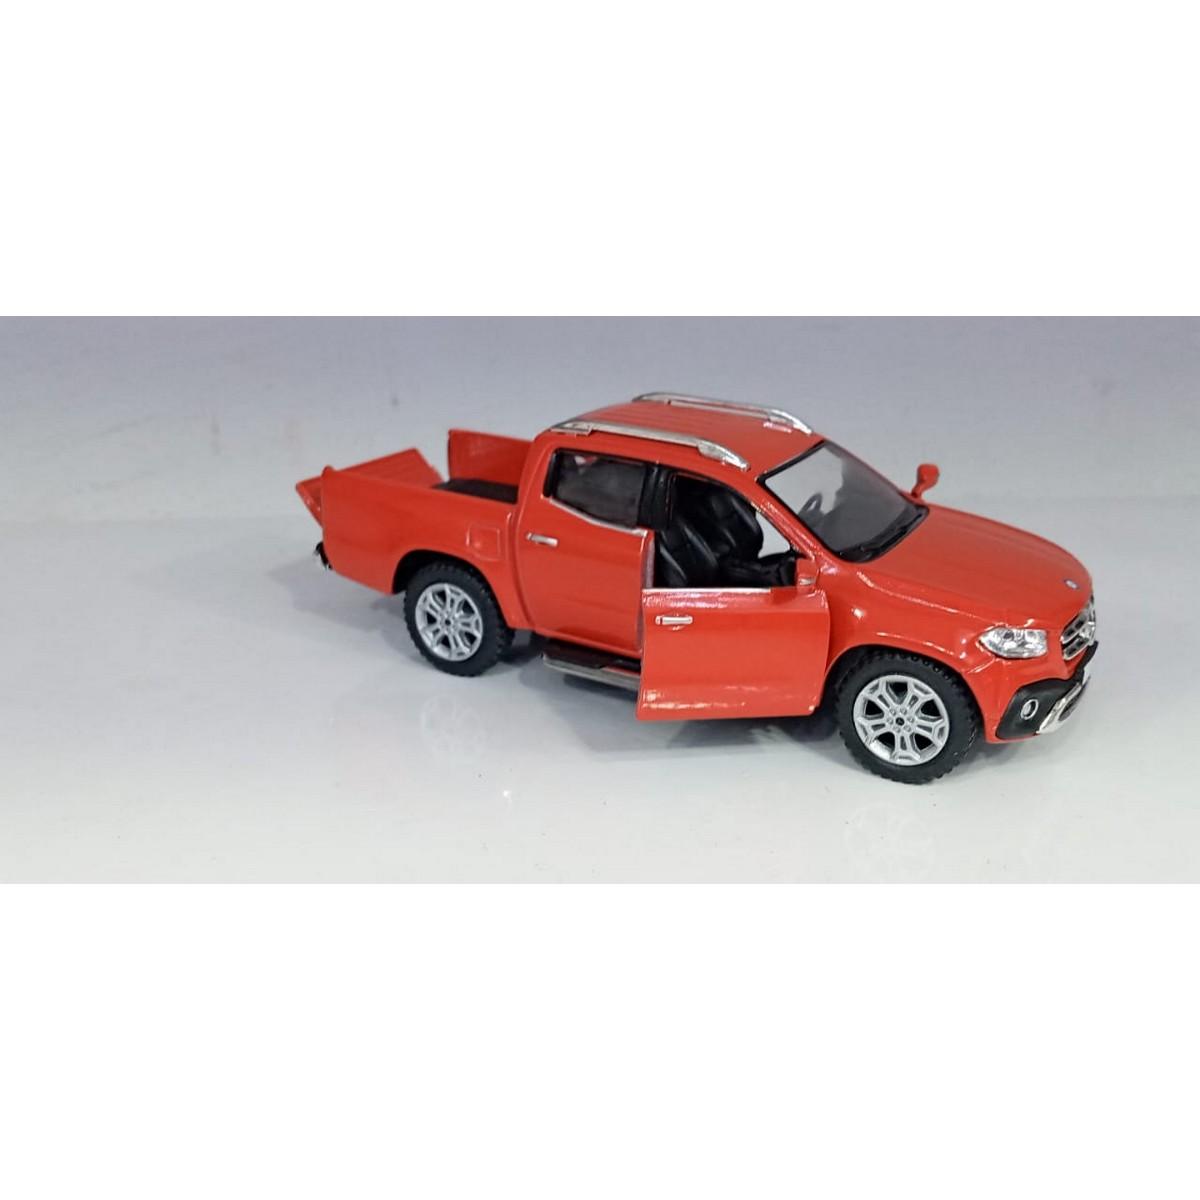 Kinsmart - 1:42 Scale Model Mercedez-Benz X-Class Pickup Diecast Model